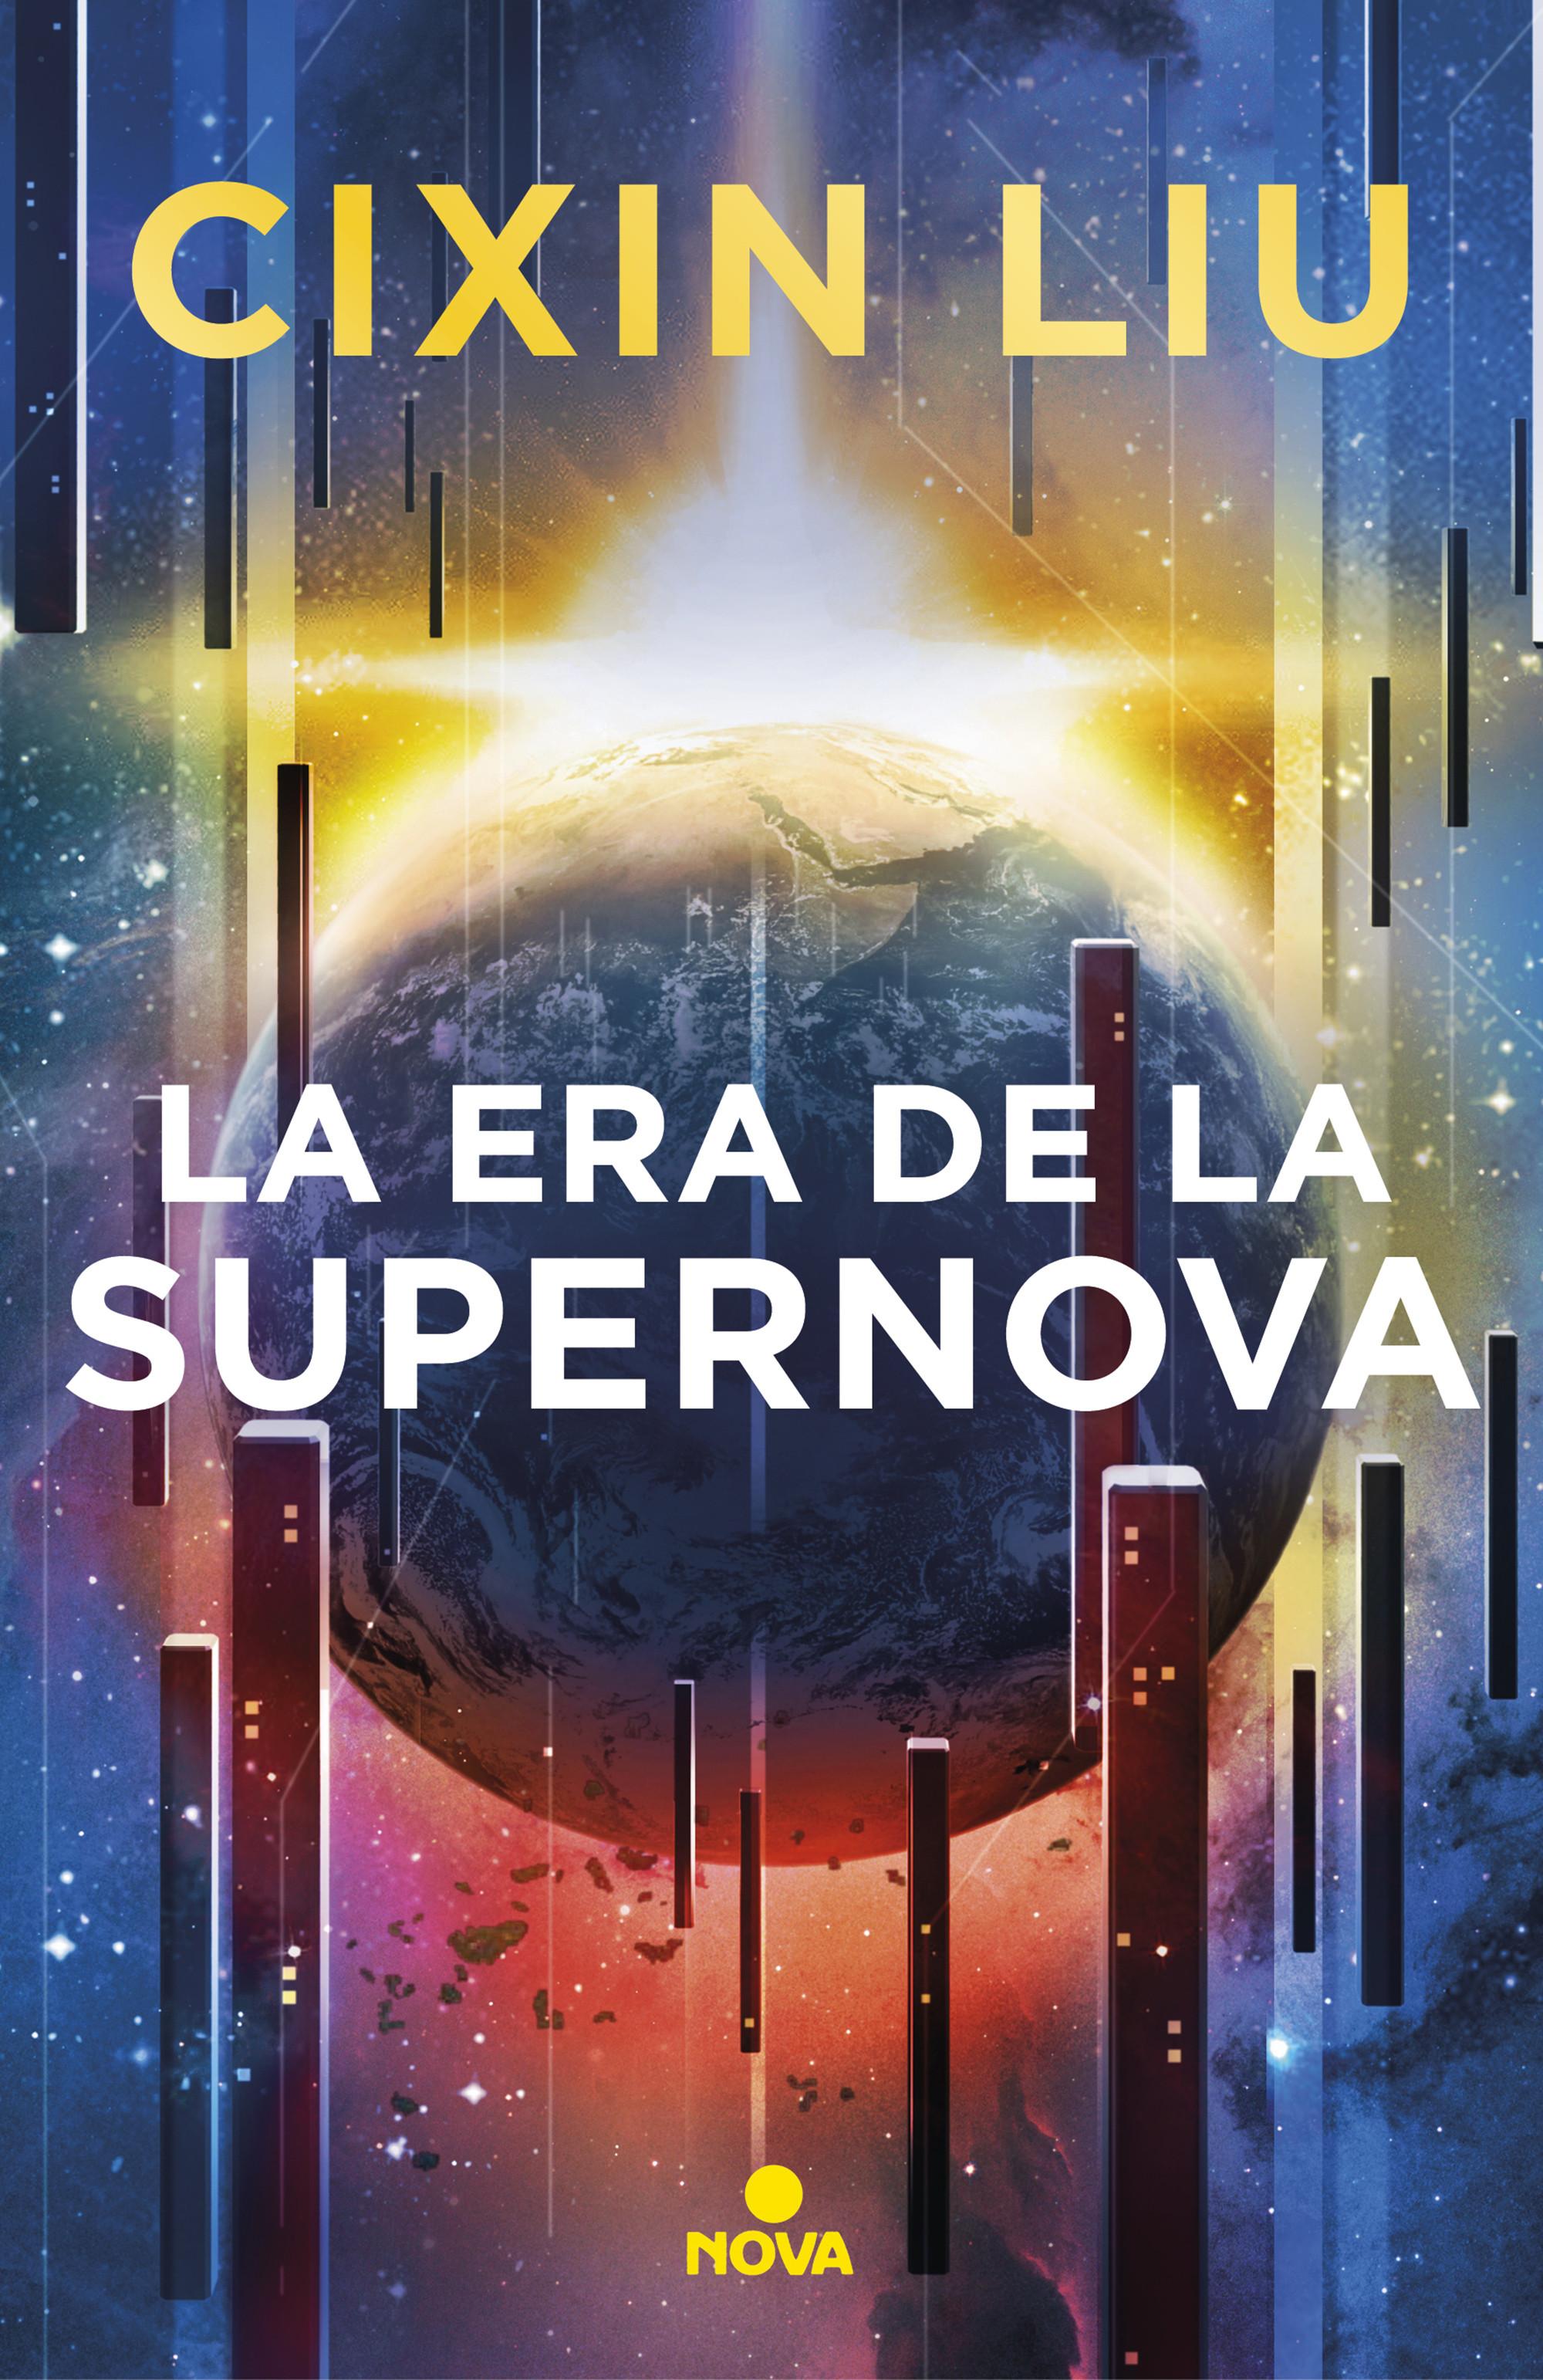 La era de la supernova